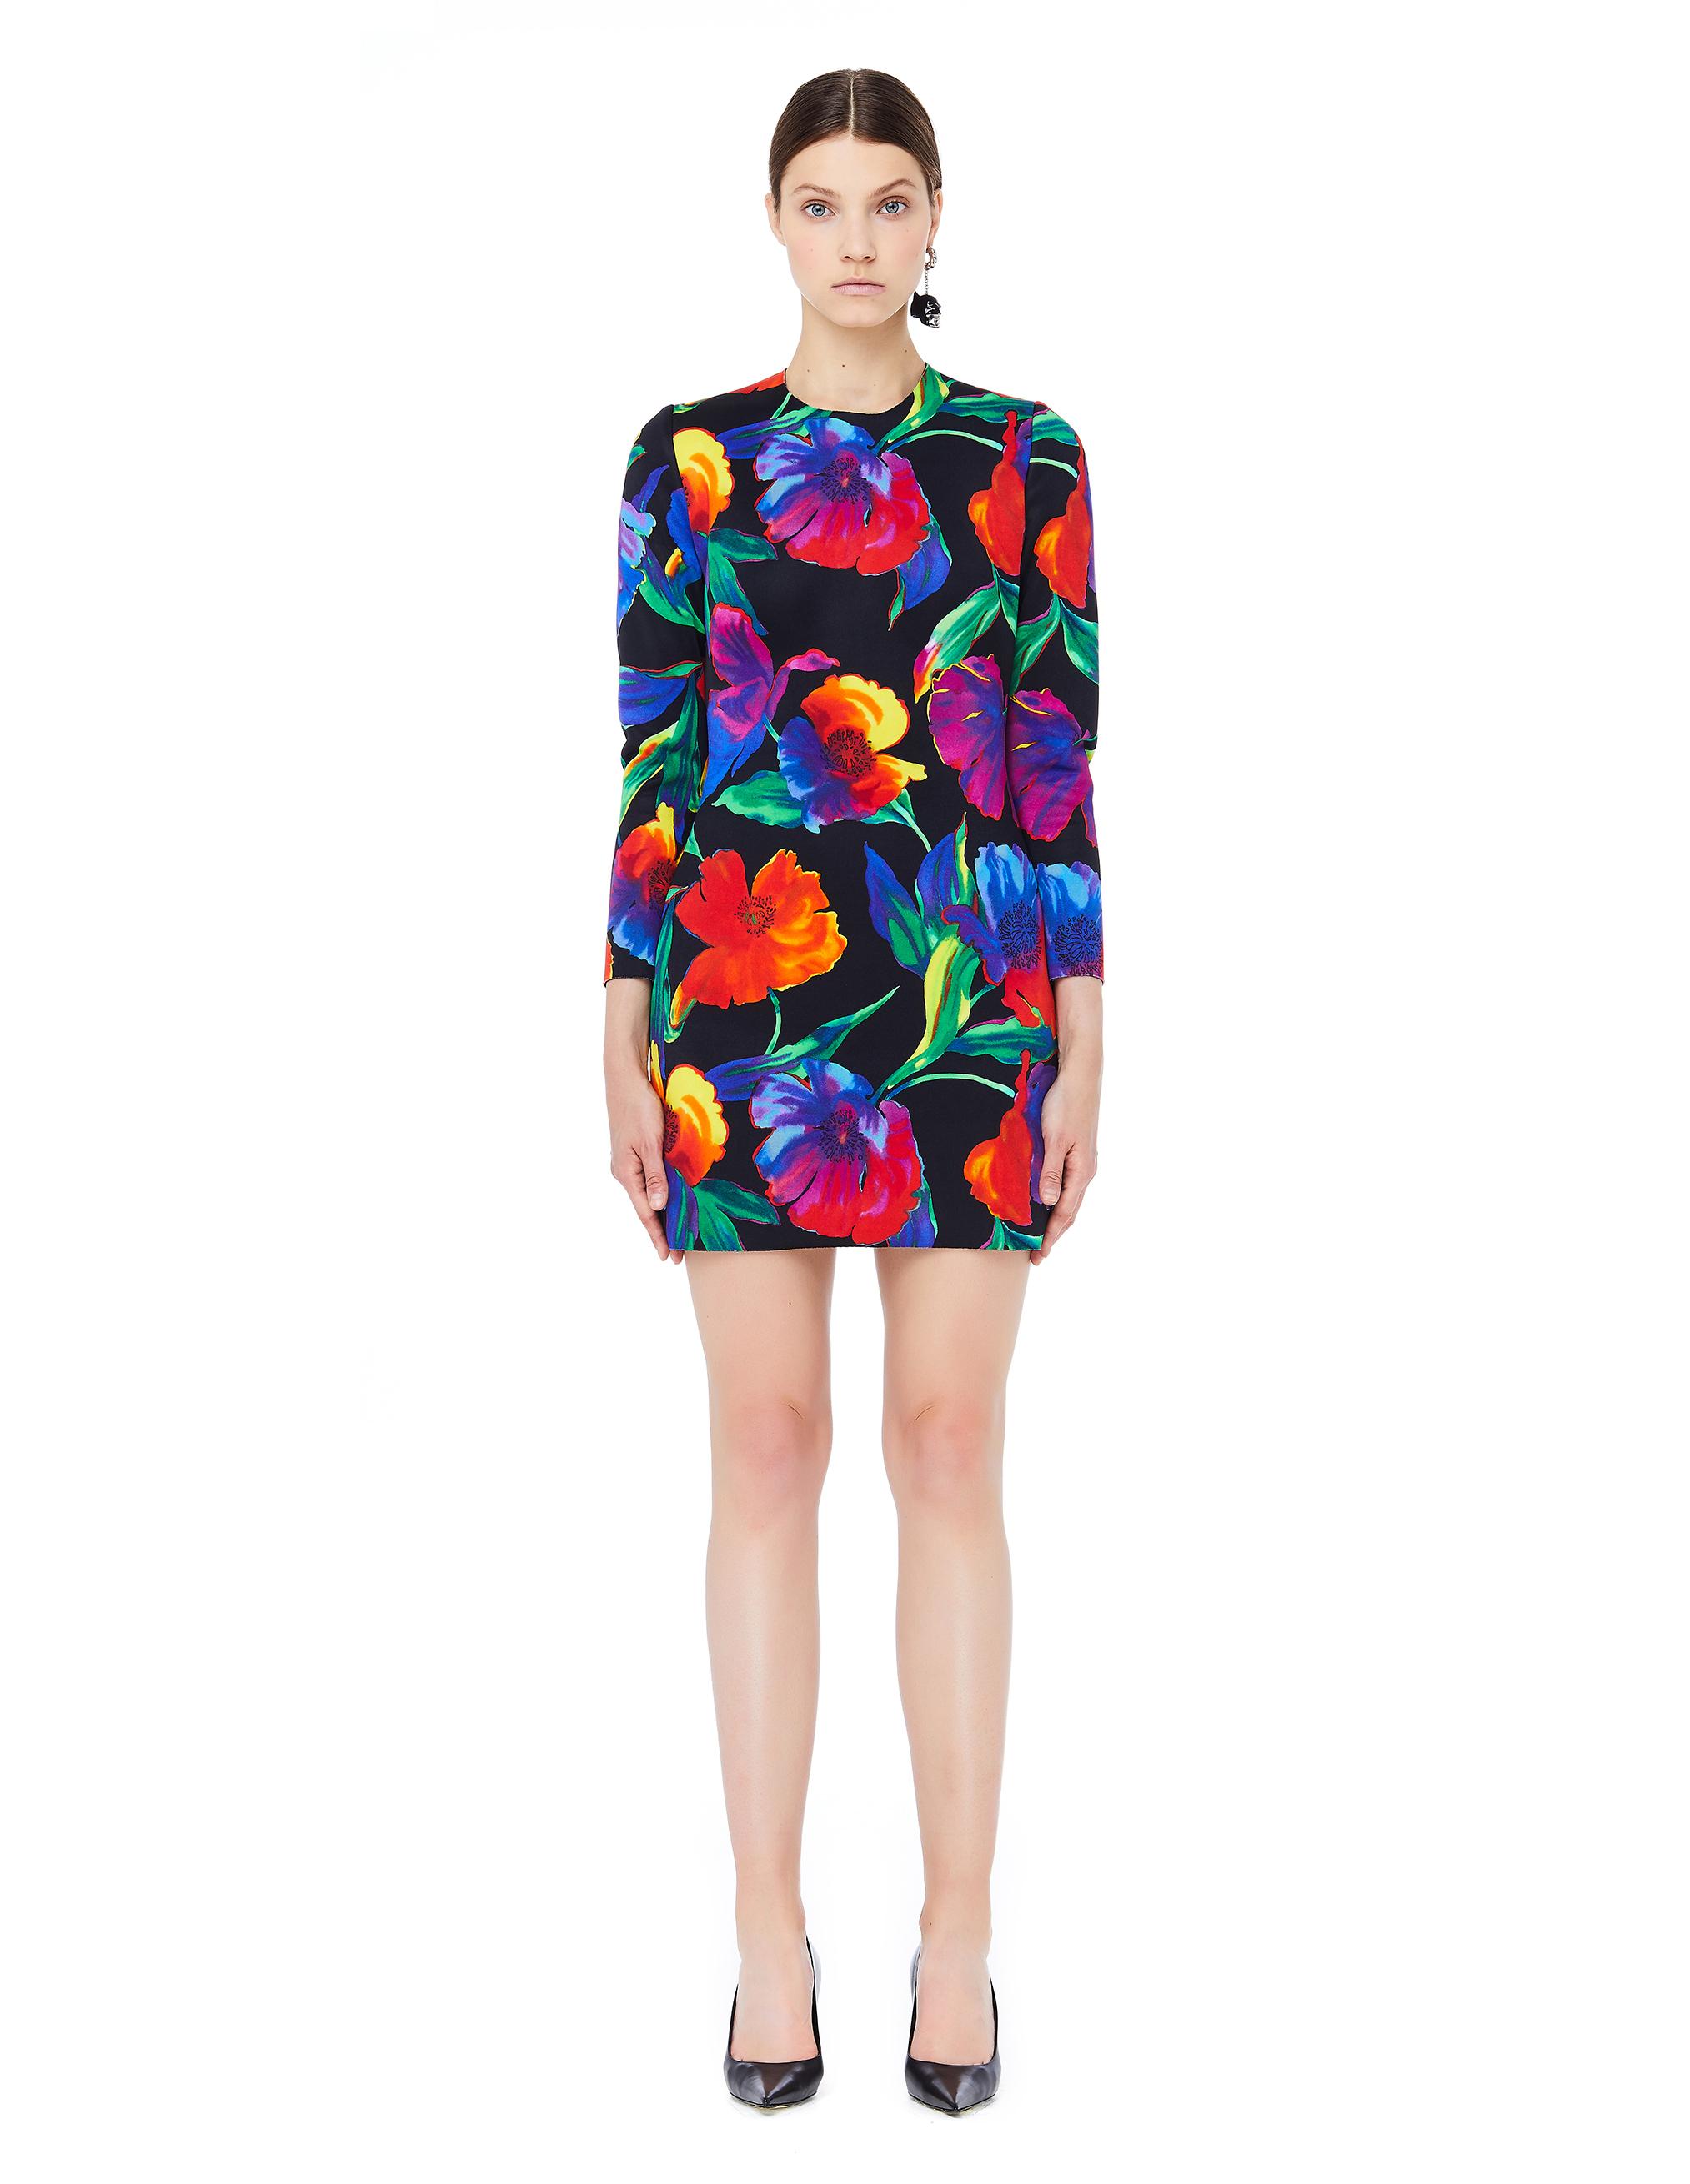 Balenciaga Flower Printed 3D Dress